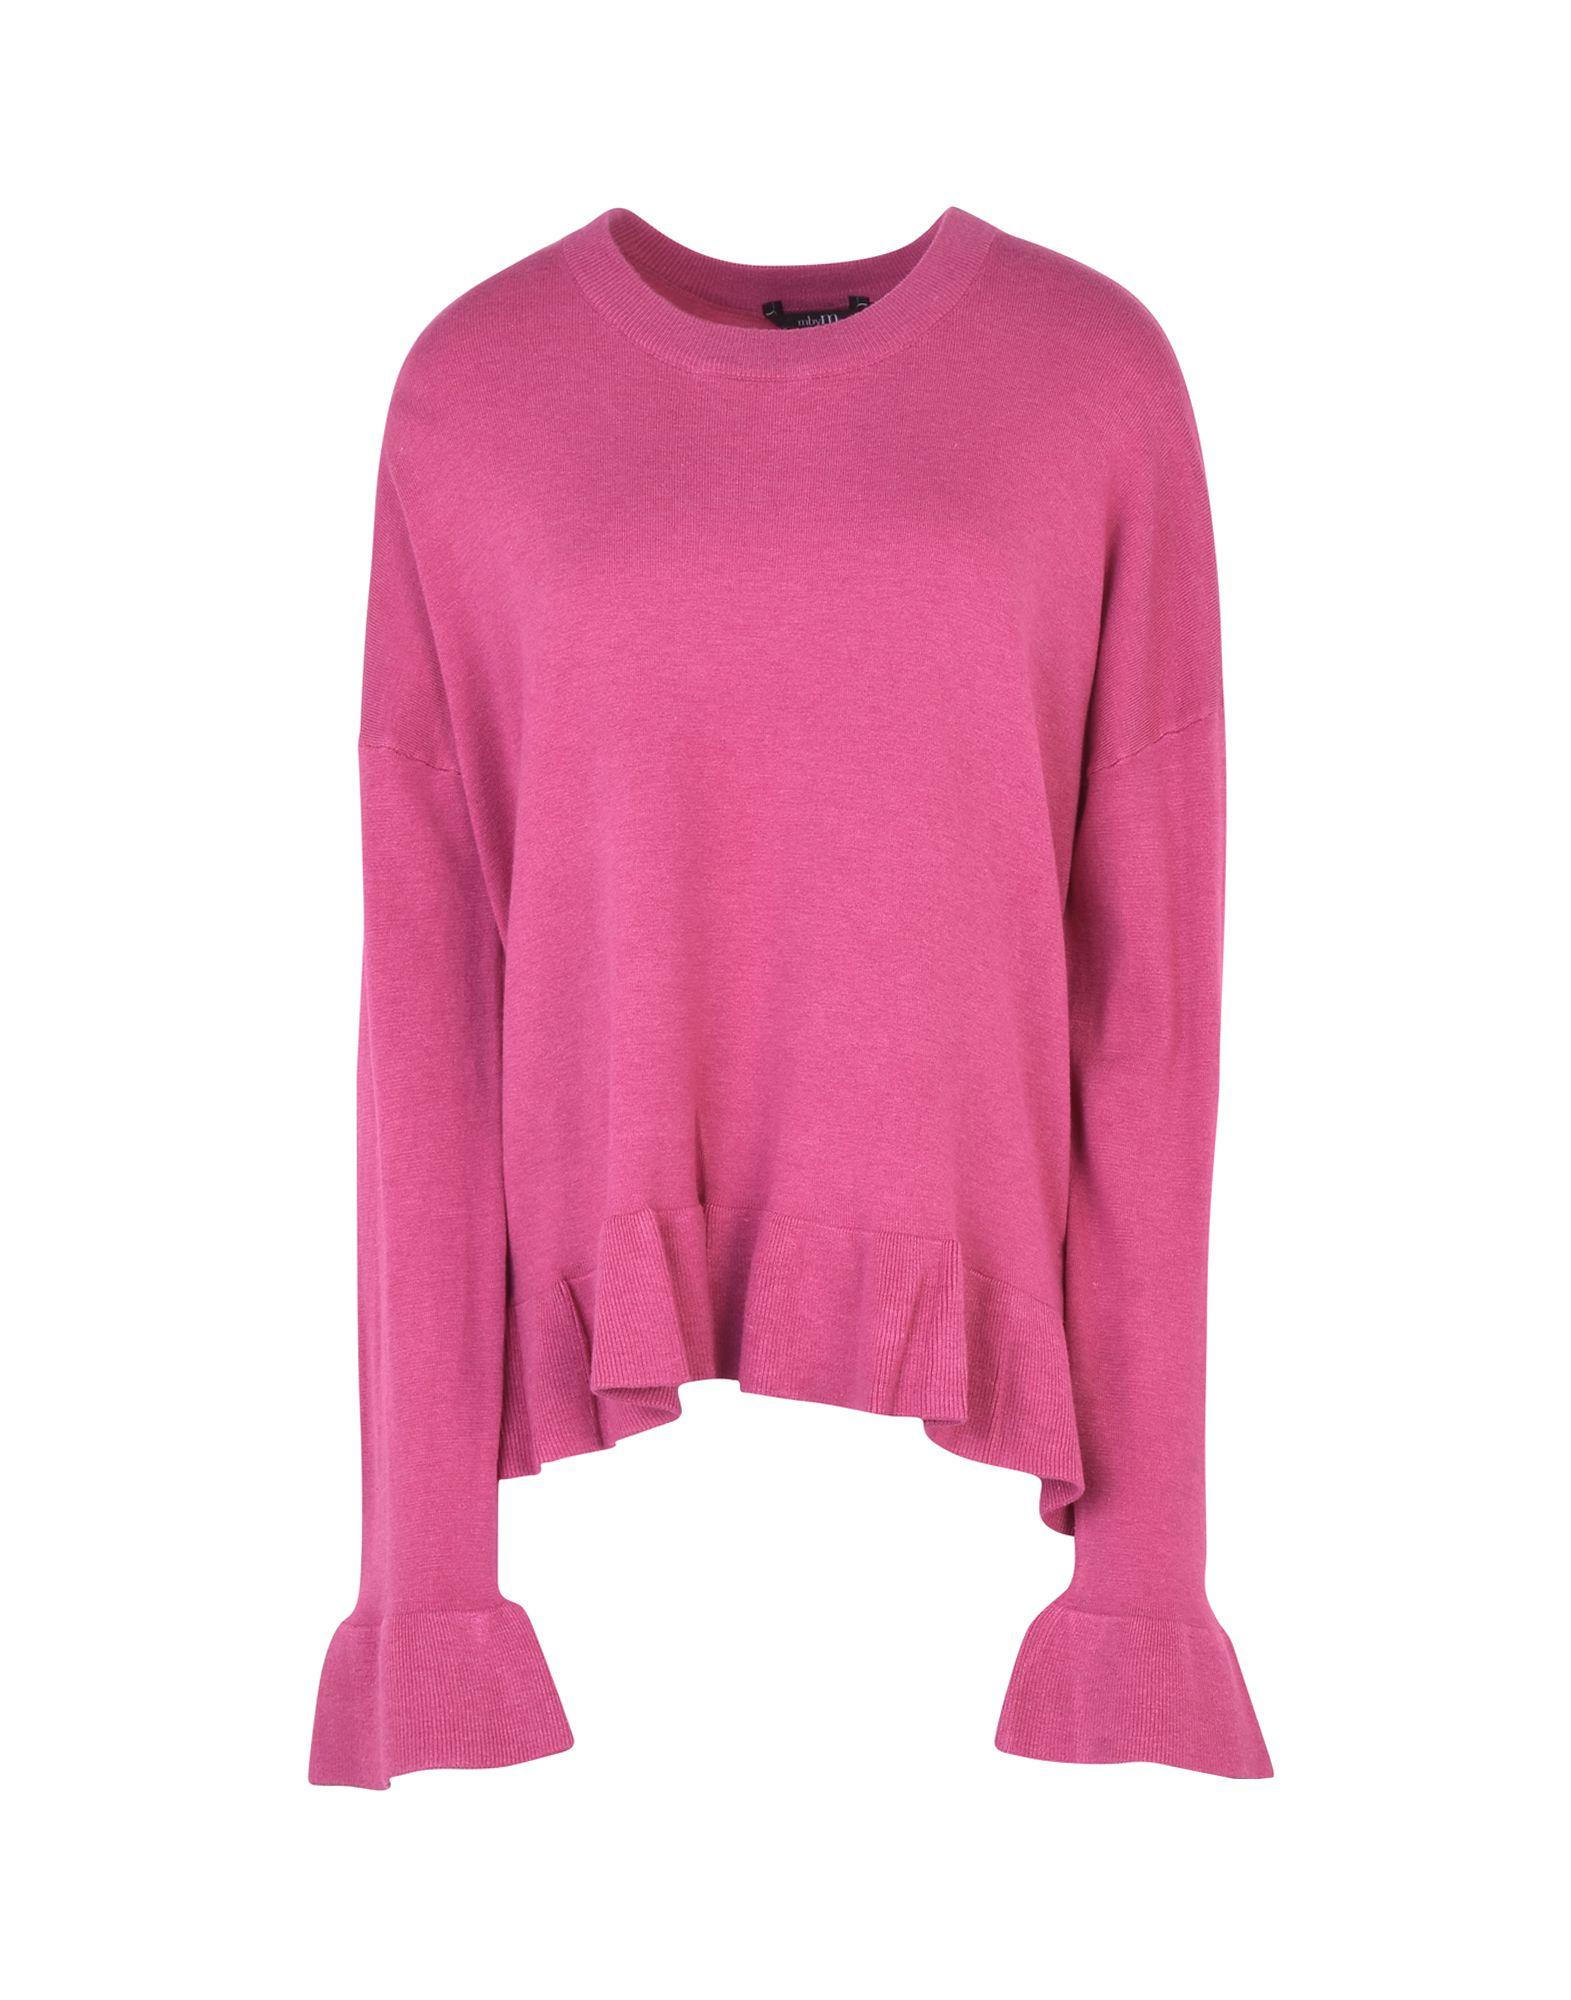 MBYM Sweater in Fuchsia